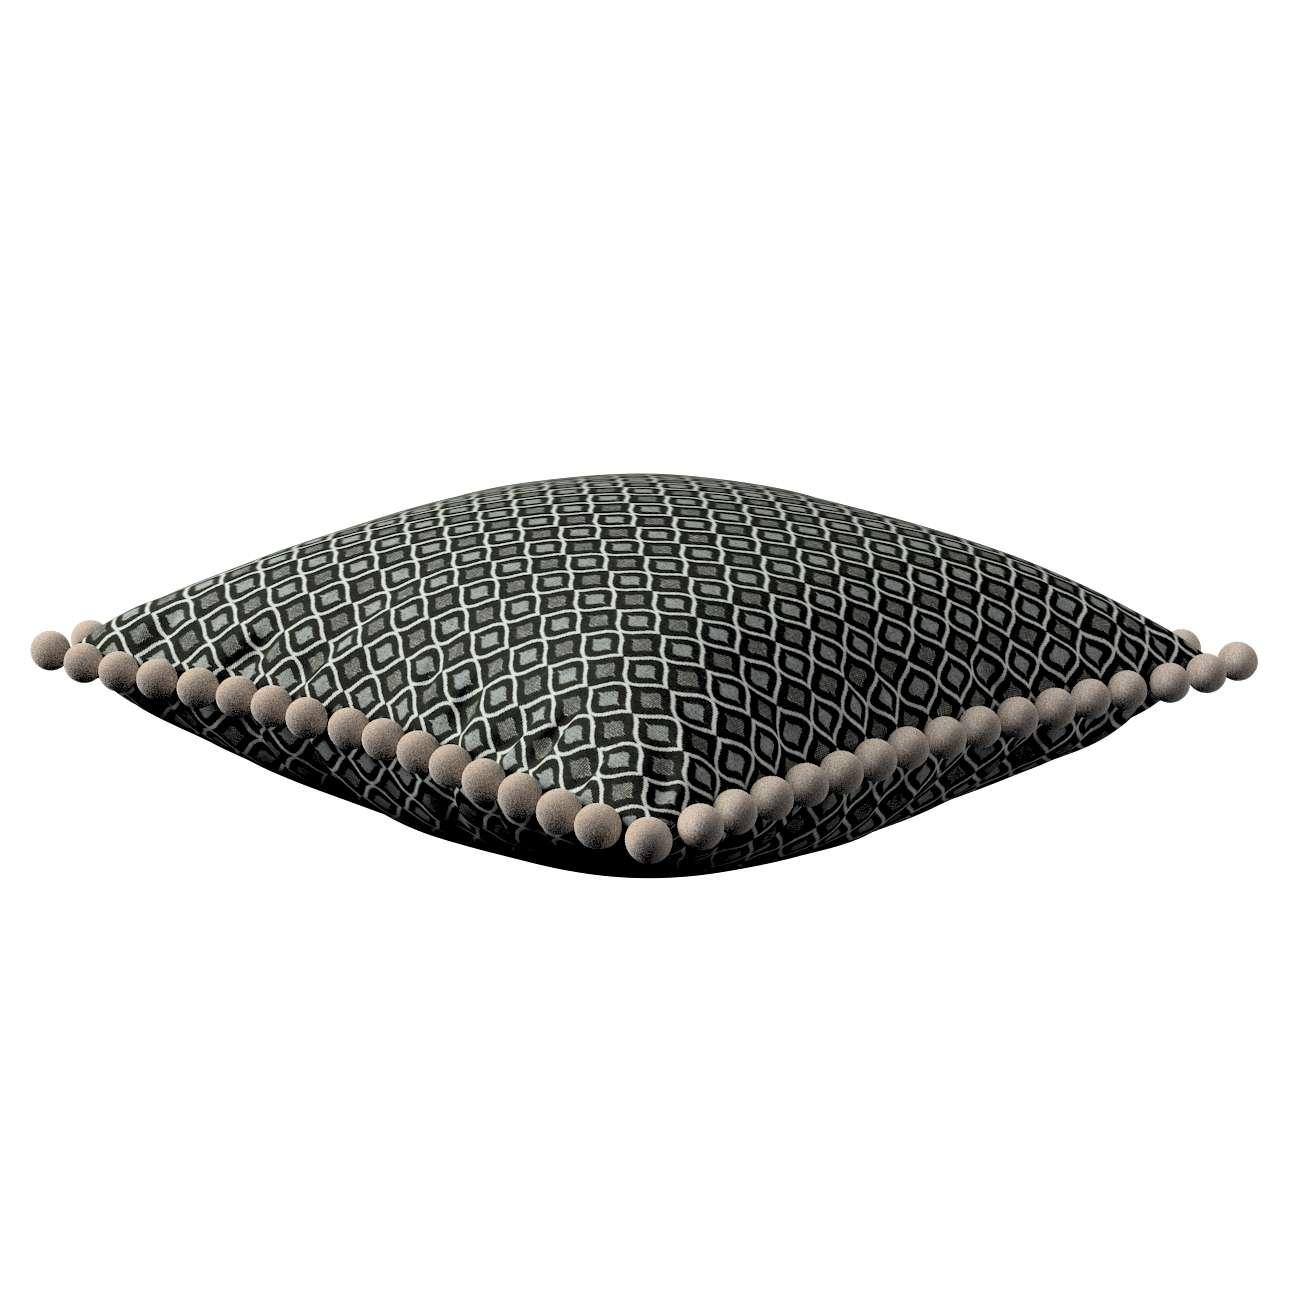 Věra - potah na polštář ozdobné bambulky po obvodu v kolekci Black & White, látka: 142-86